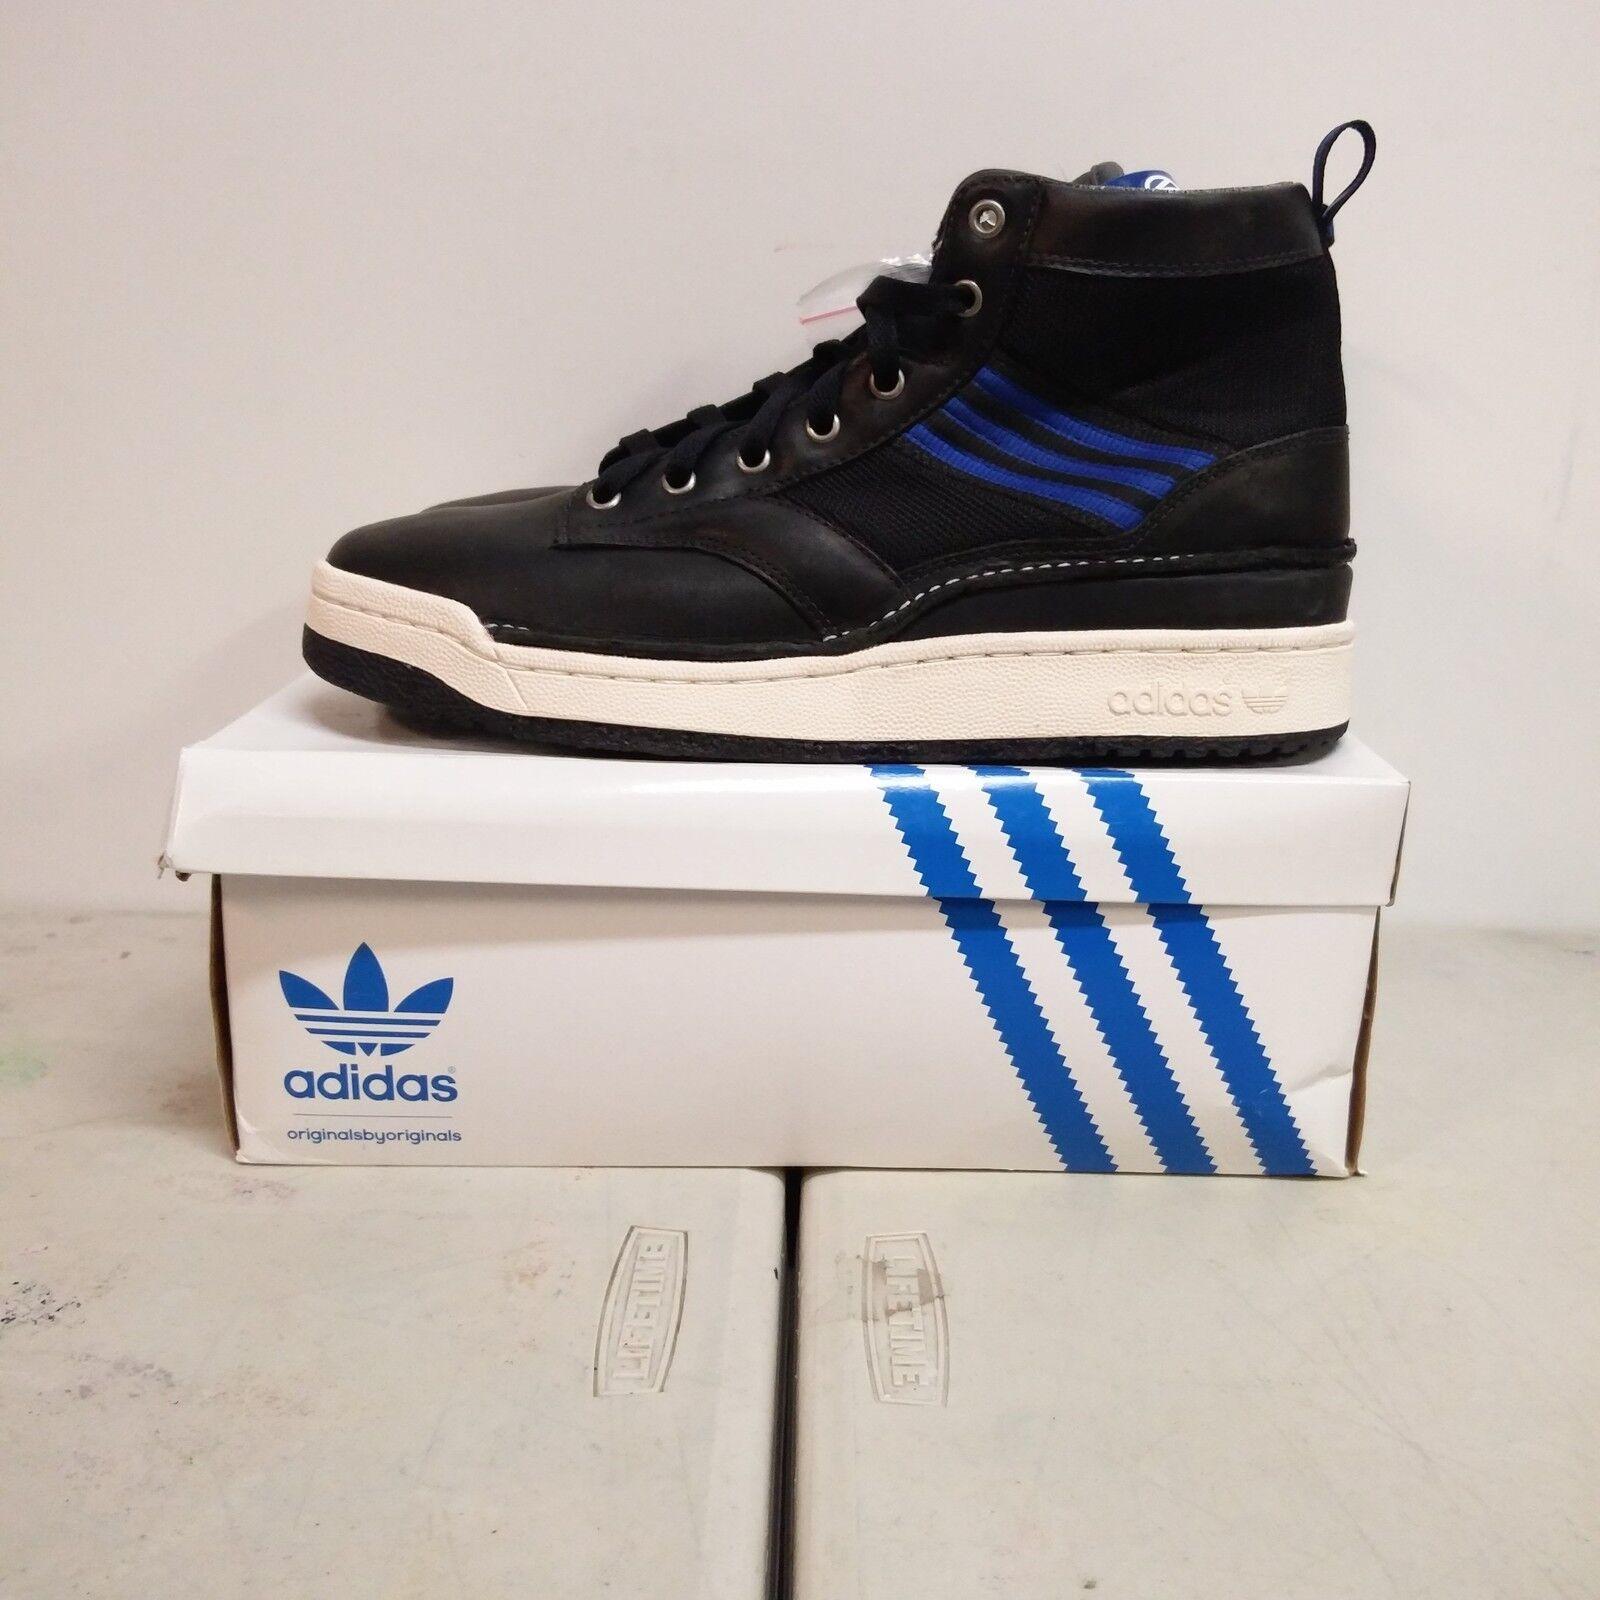 Adidas Originals ObyO 7 Hole KzK Kazuki Japan Boots Men Shoes Rare G03314 11